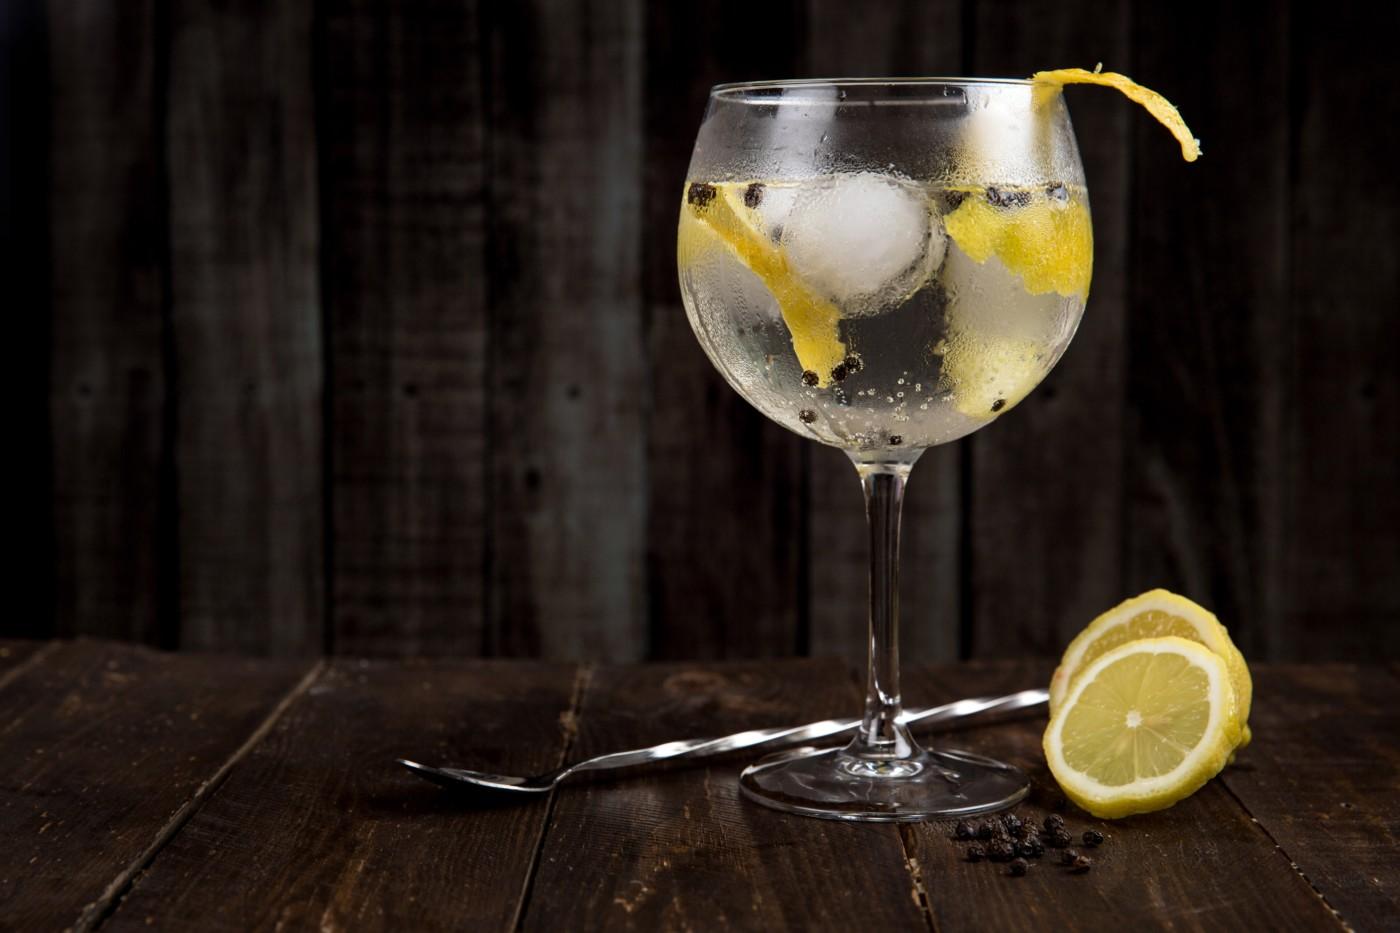 GVP bebidas espirituosas: Oferta de empleo en Valencia